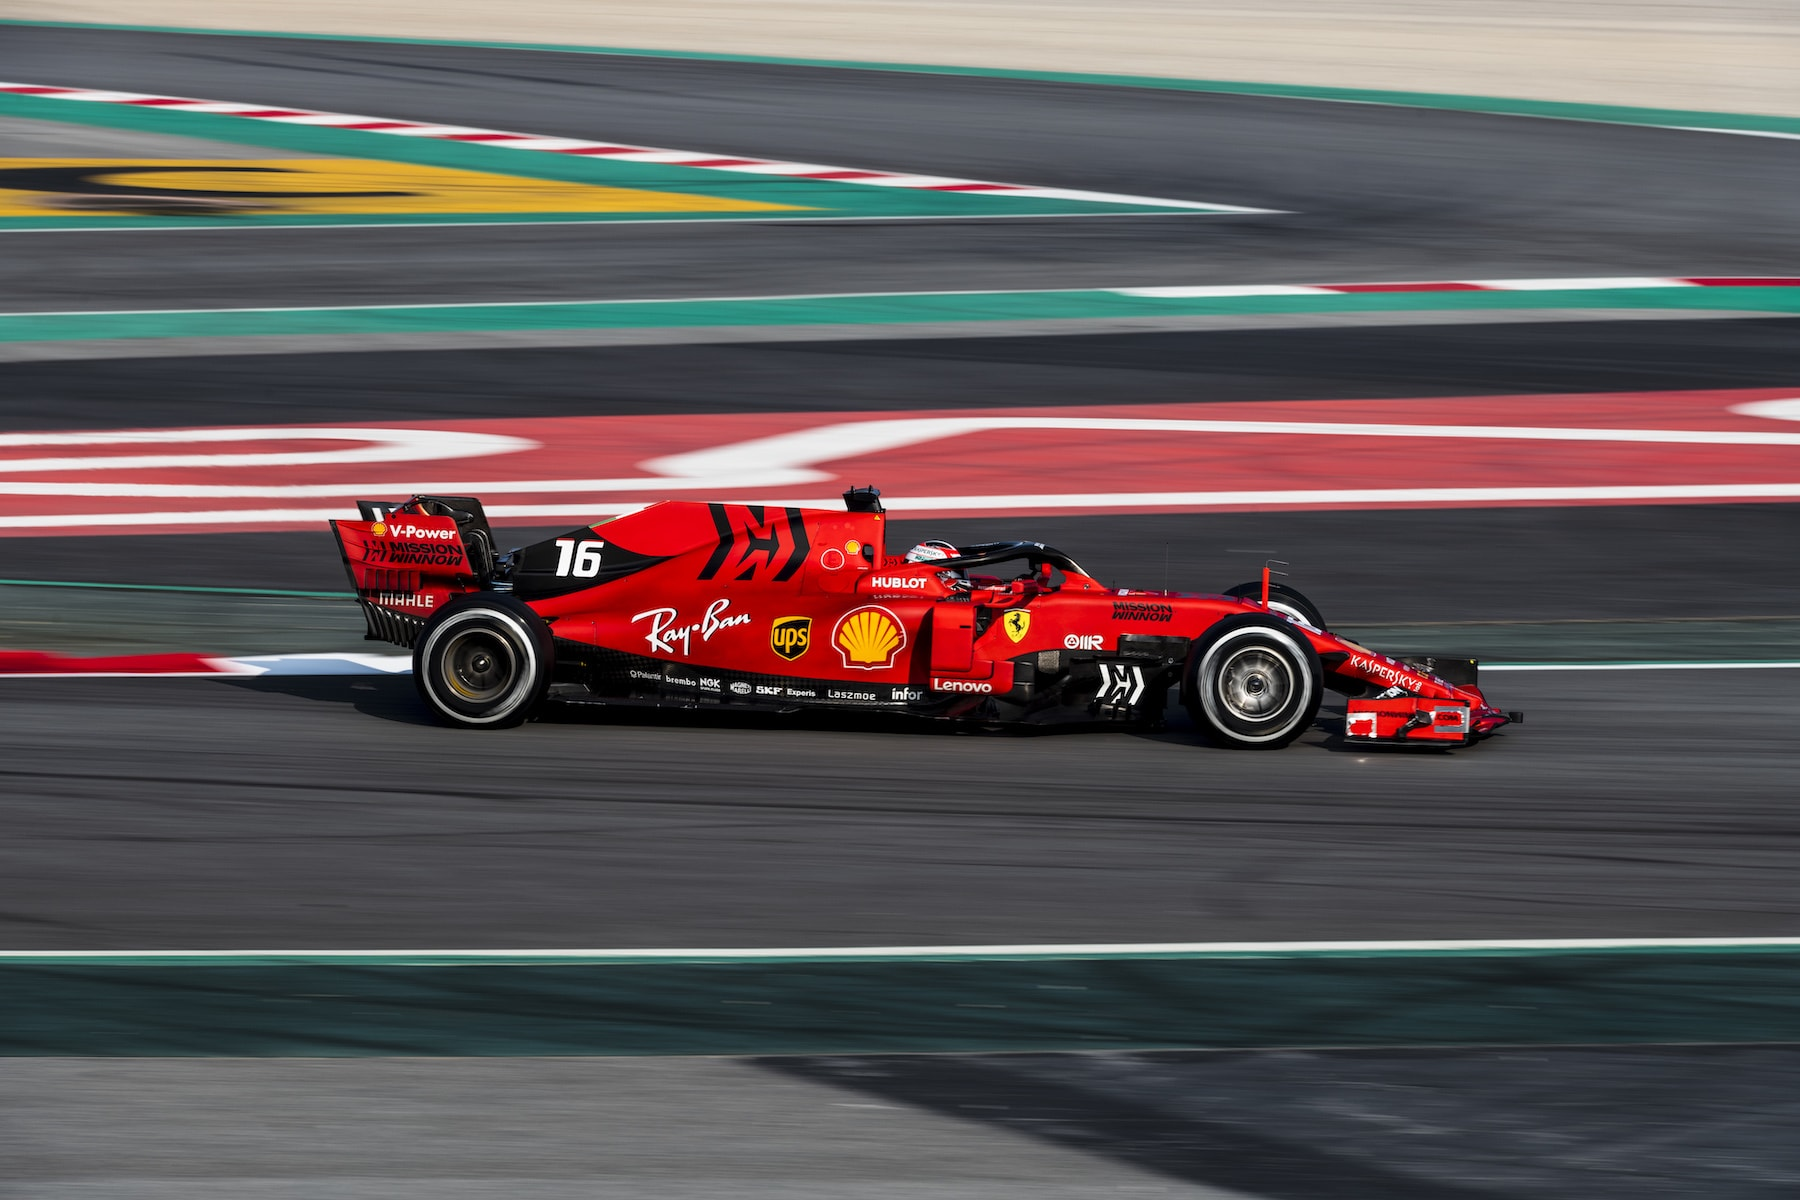 2019 Charles Leclerc | Ferrari SF90 | 2019 Barcelona T2 D1 1.jpg